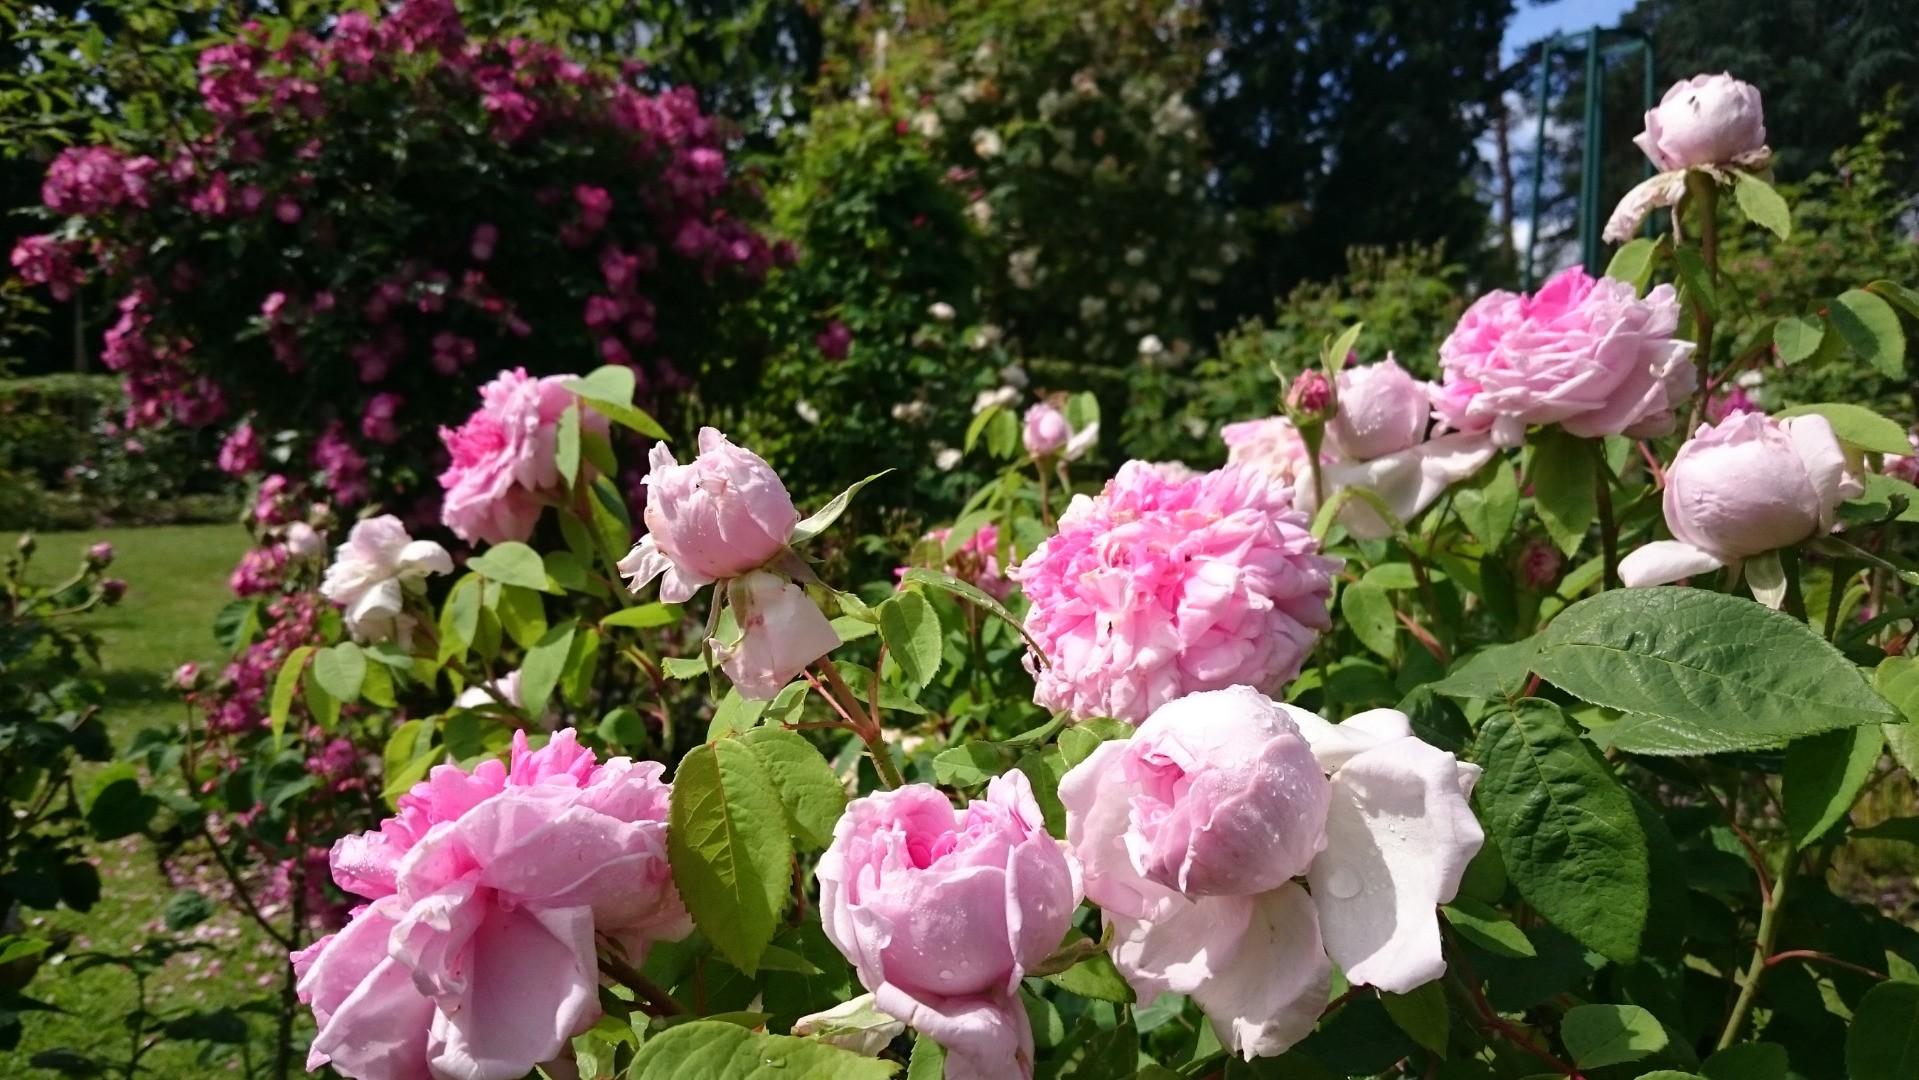 Dimanche Rose